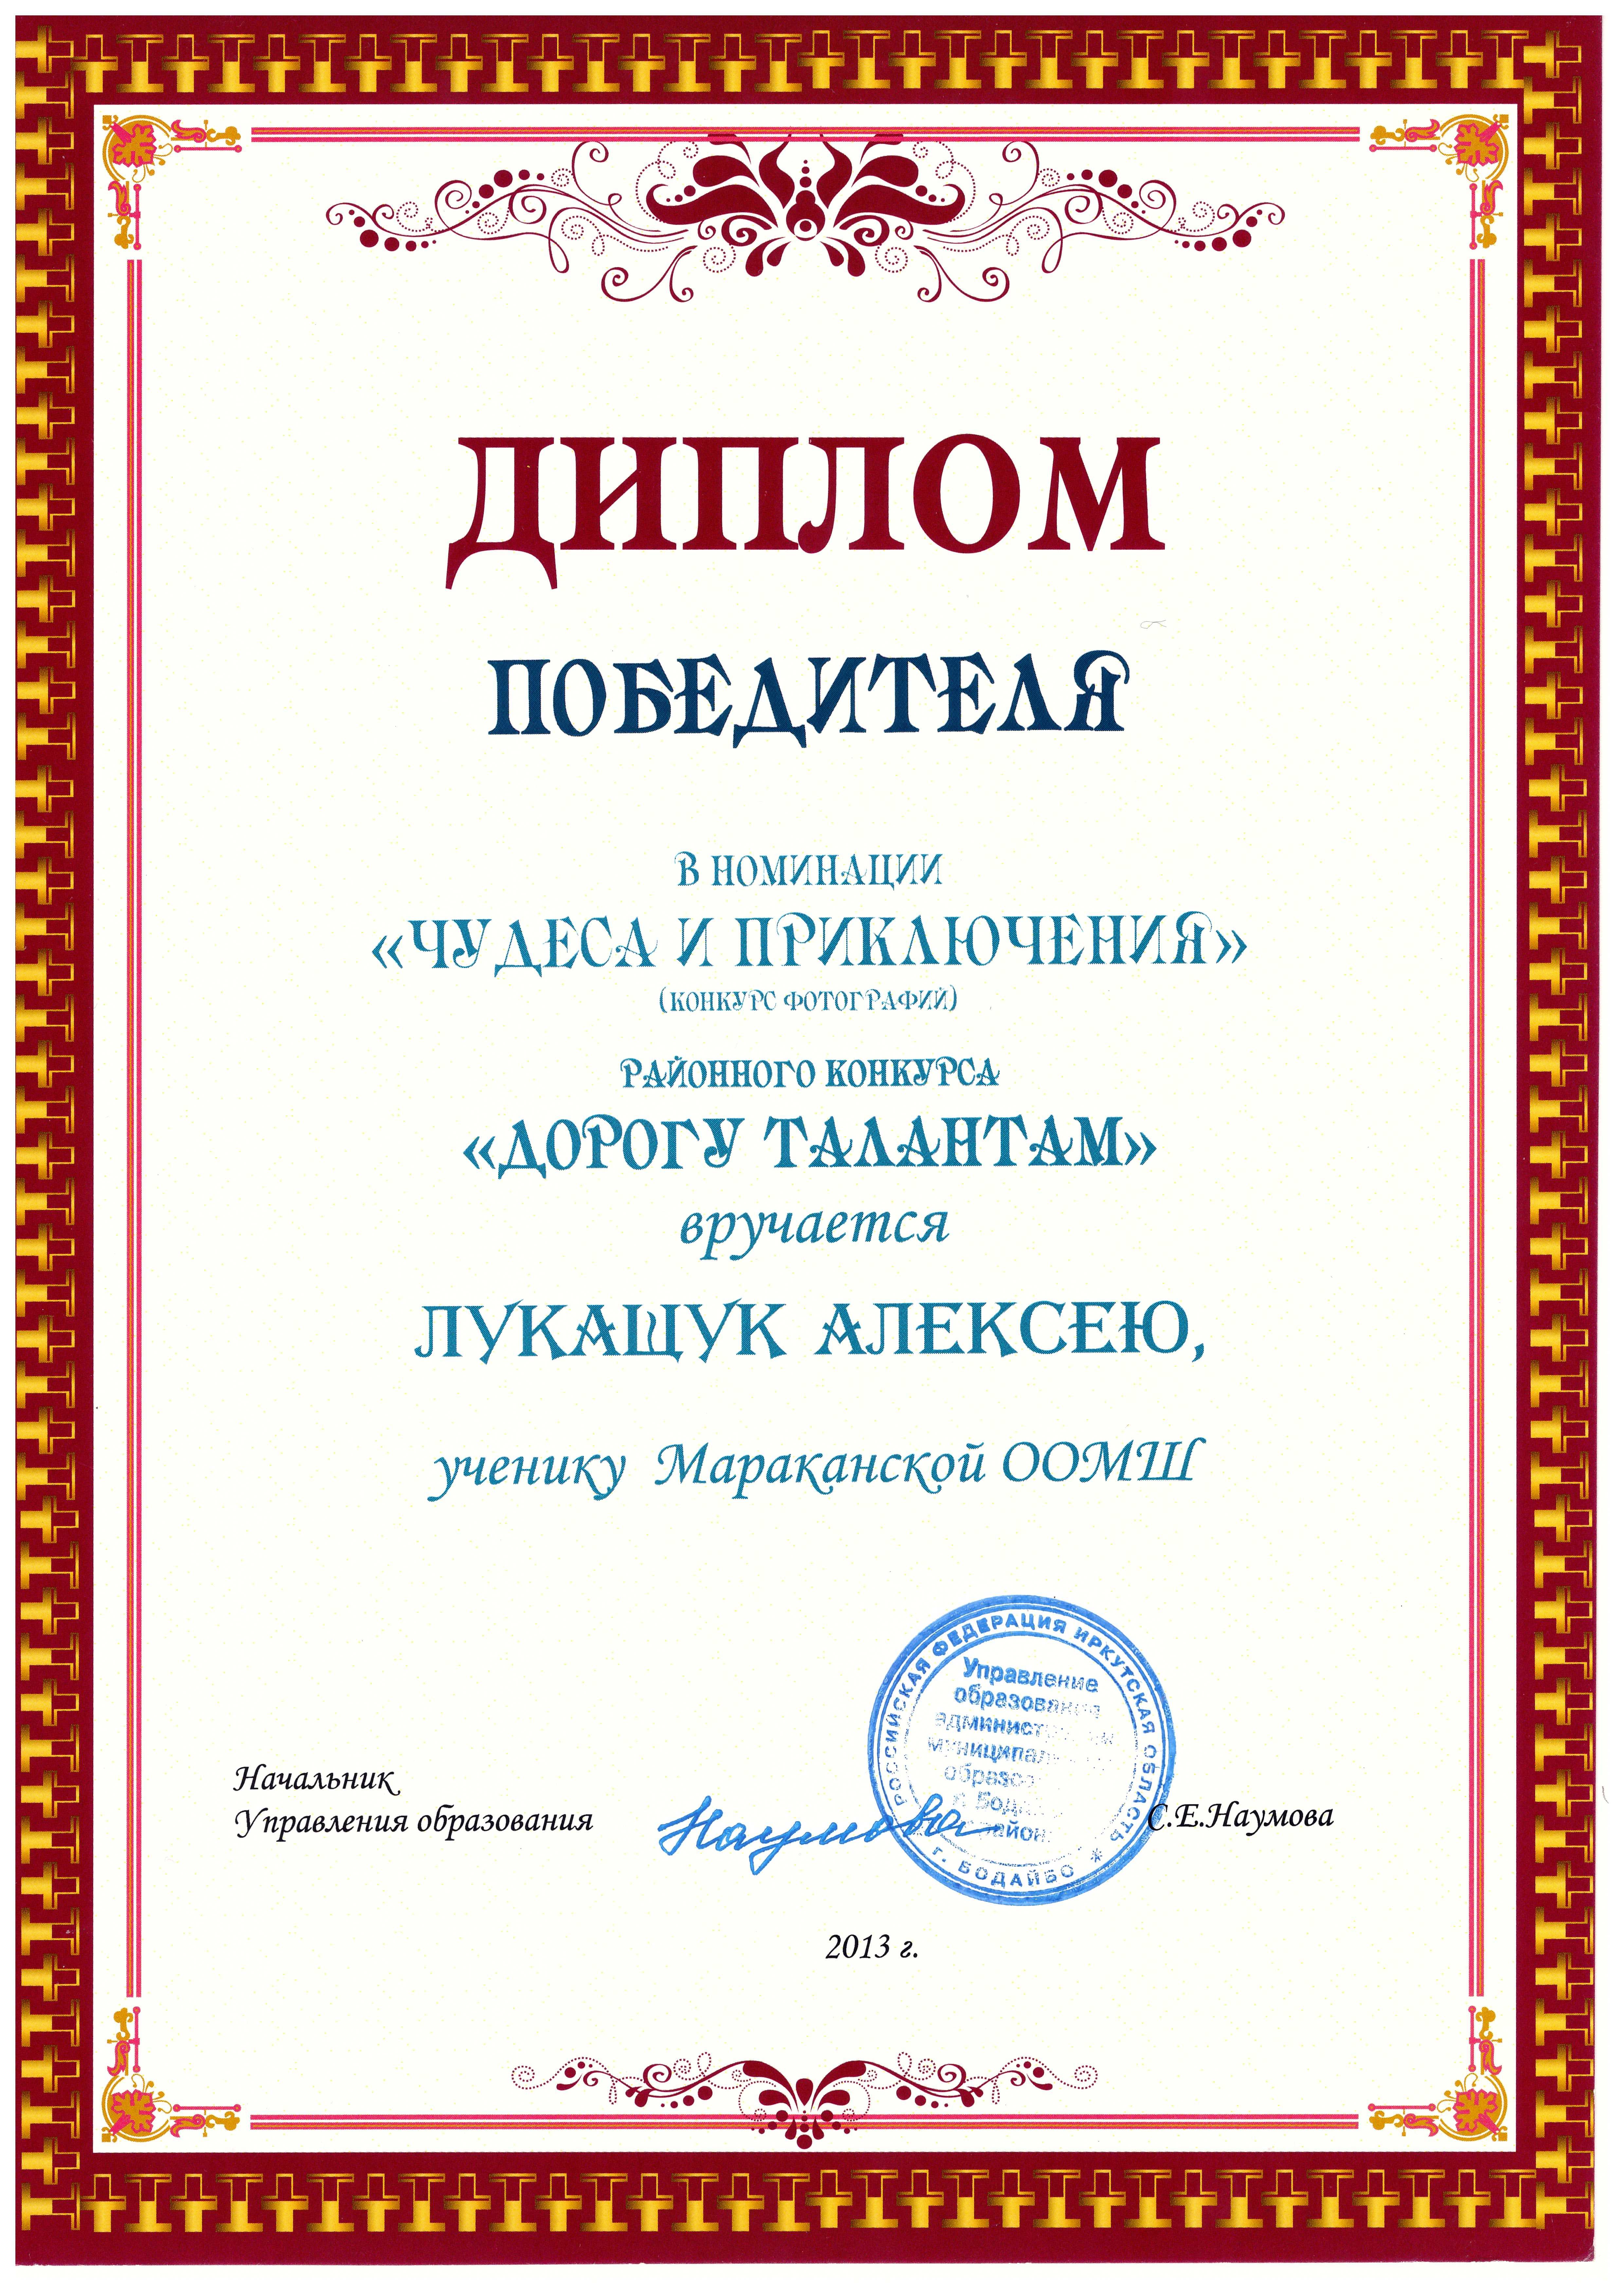 Грамота Лукащук Алексея